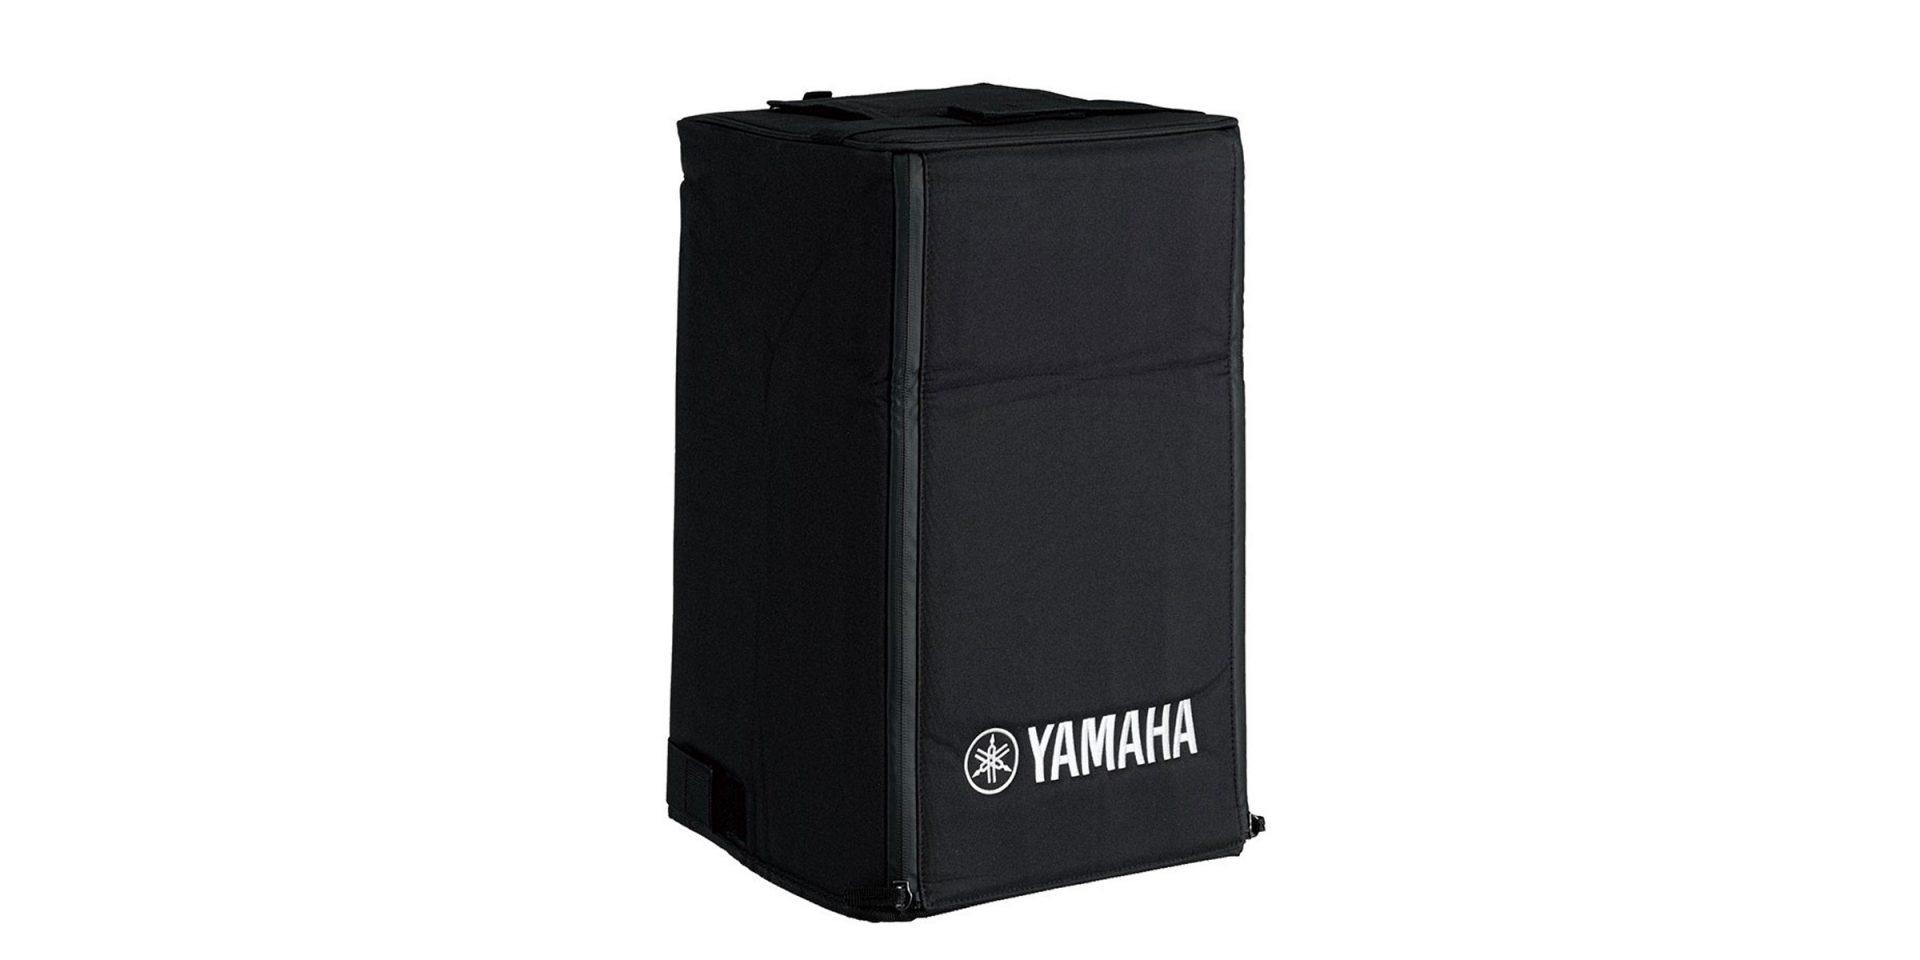 Yamaha SPCVR0801